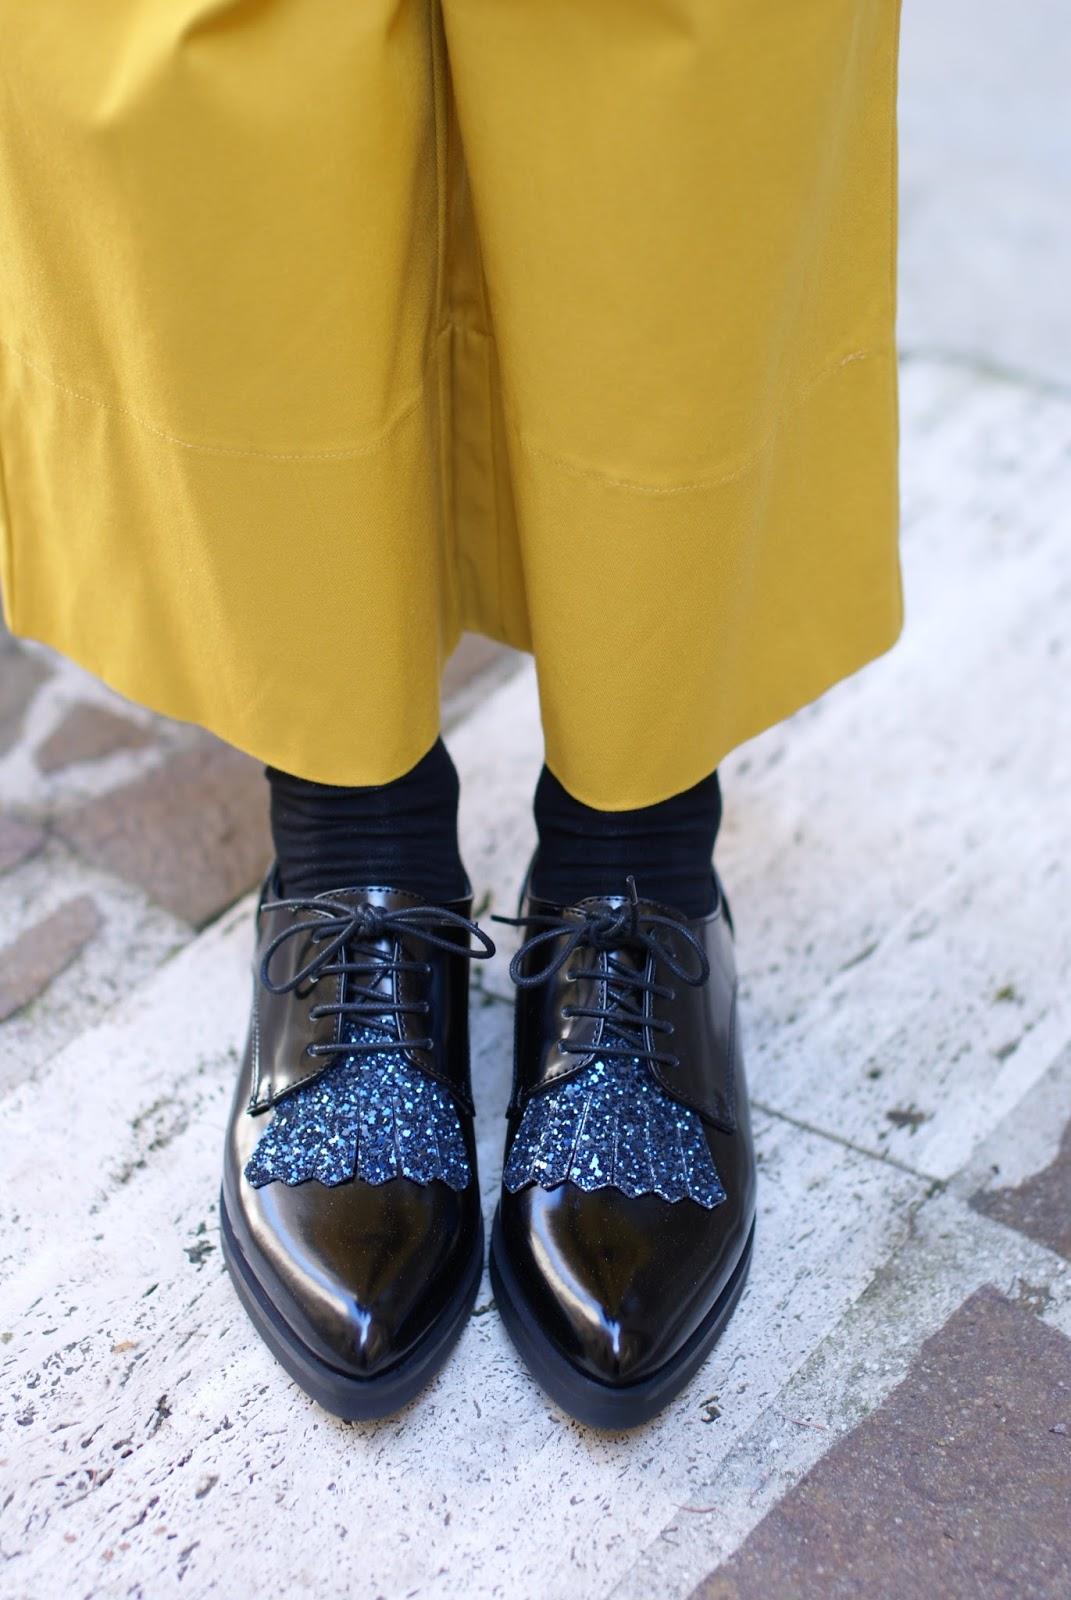 Lace-up glitter shoes, Lorenzo Mari shoes on Fashion and Cookies fashion blog, fashion blogger style